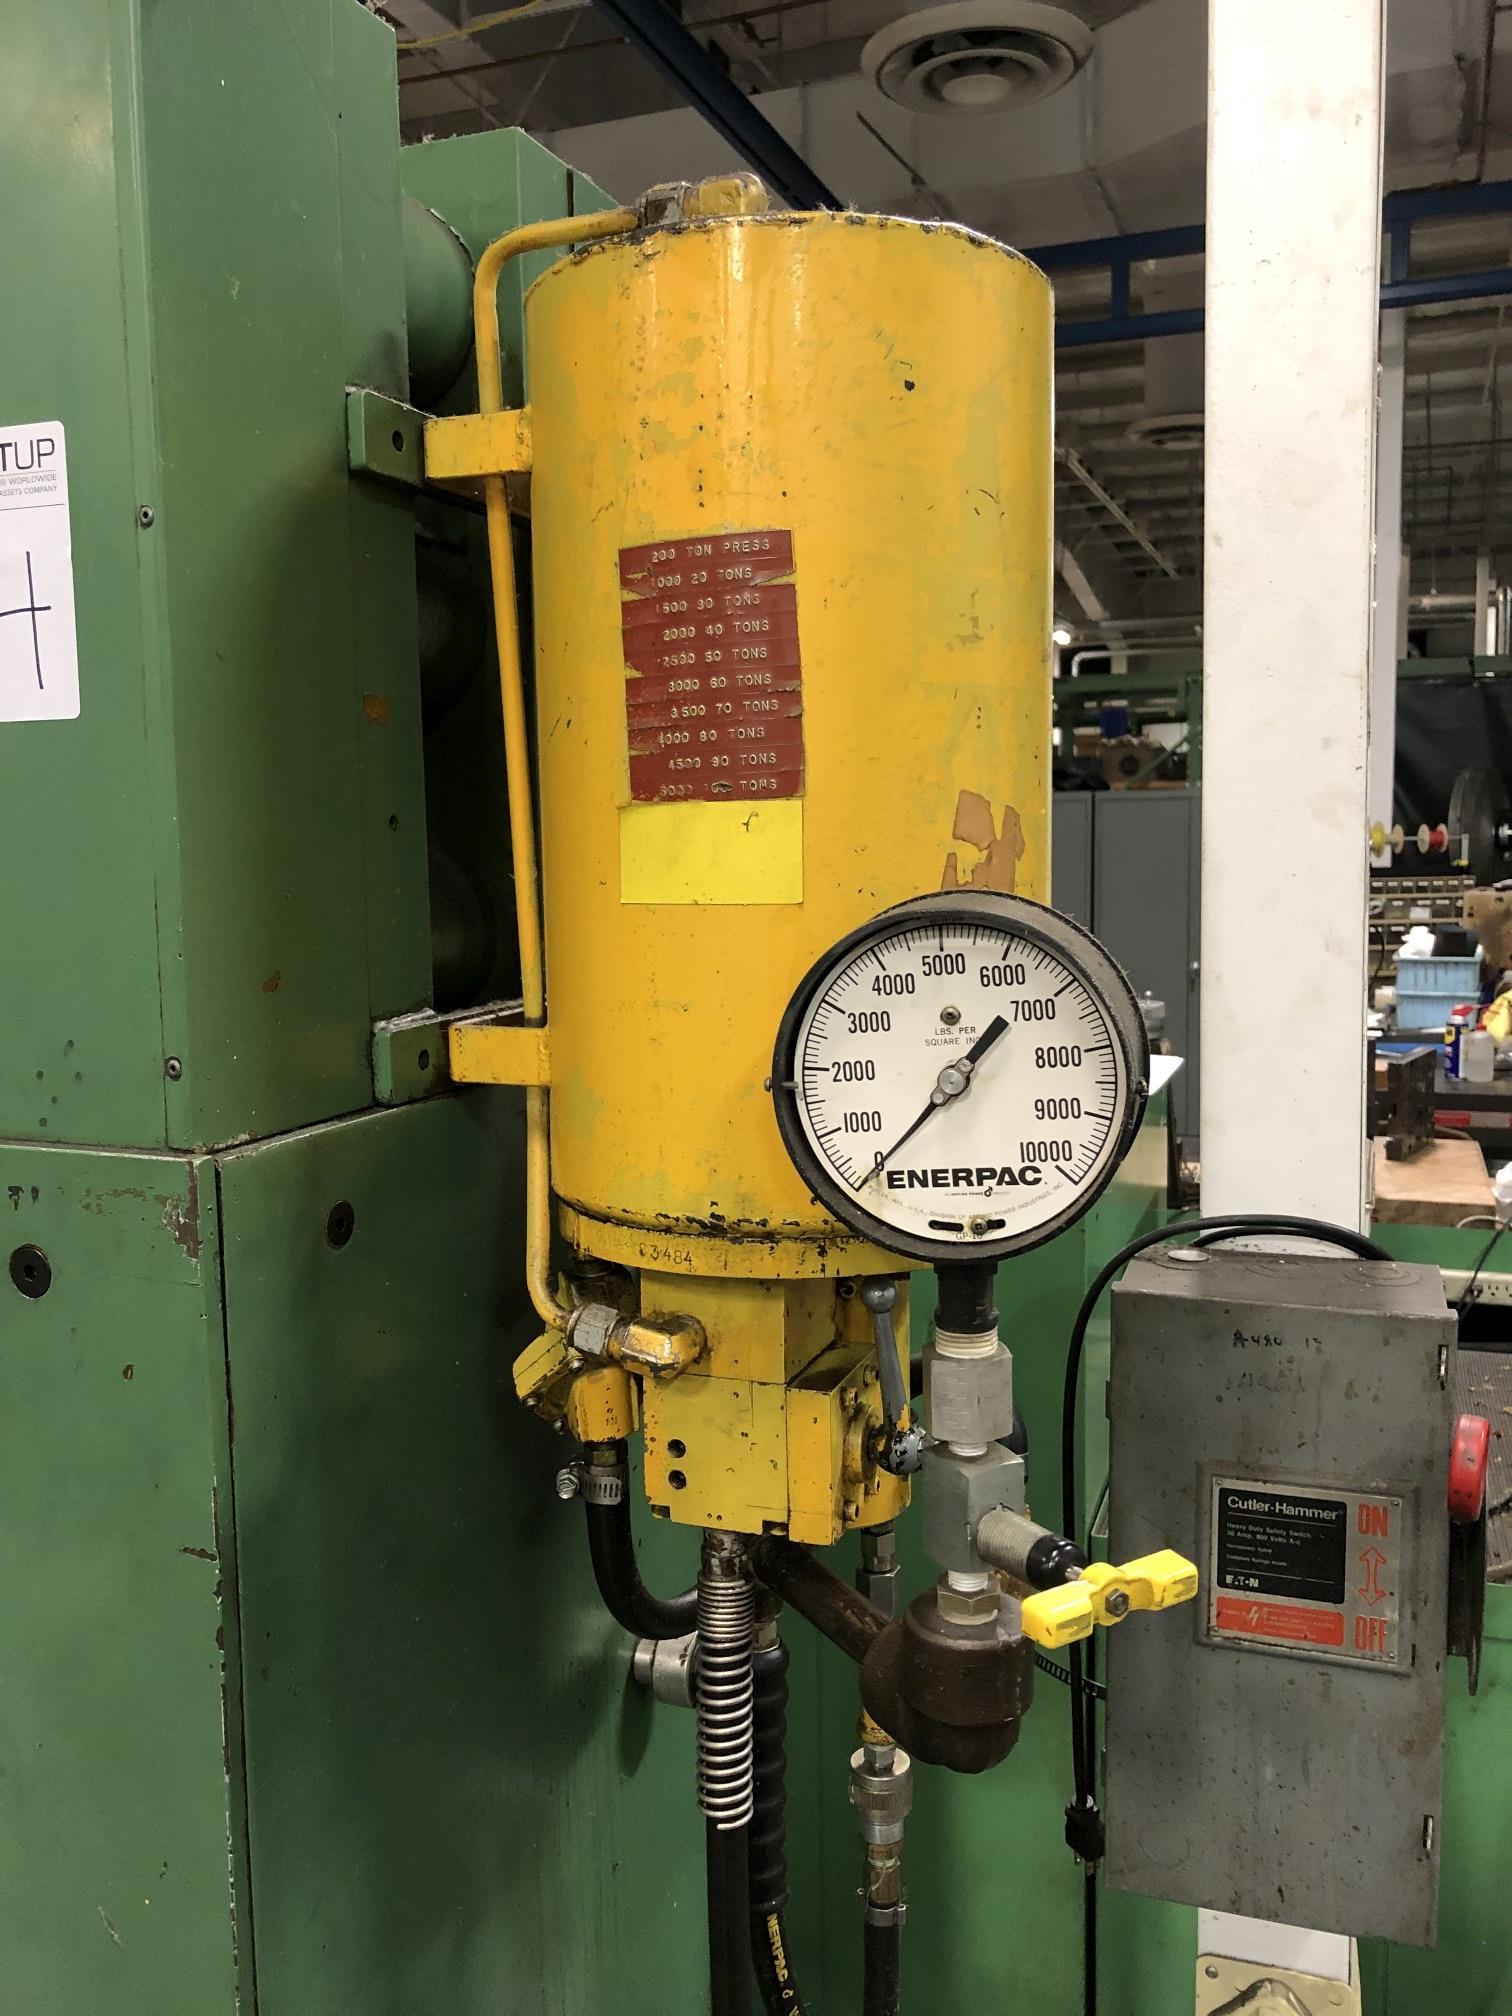 Dake 200 Ton Hydraulic Press - Image 3 of 6